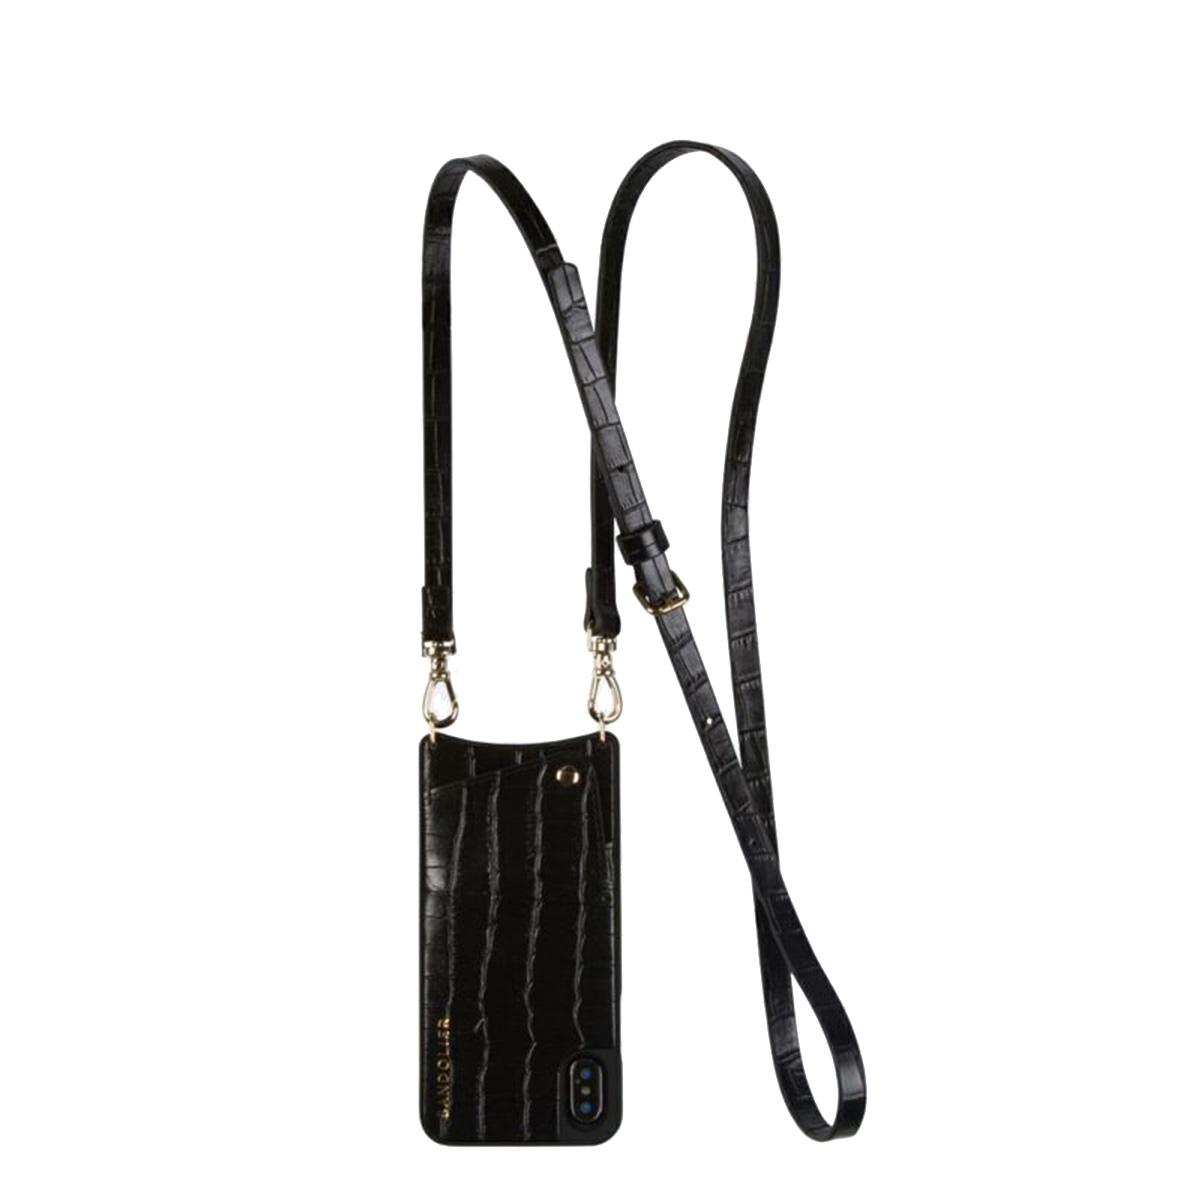 BANDOLIER EMMA CROC BLACK バンドリヤー iPhone XS MAX ケース スマホ 携帯 レディース ブラック 黒 10emm